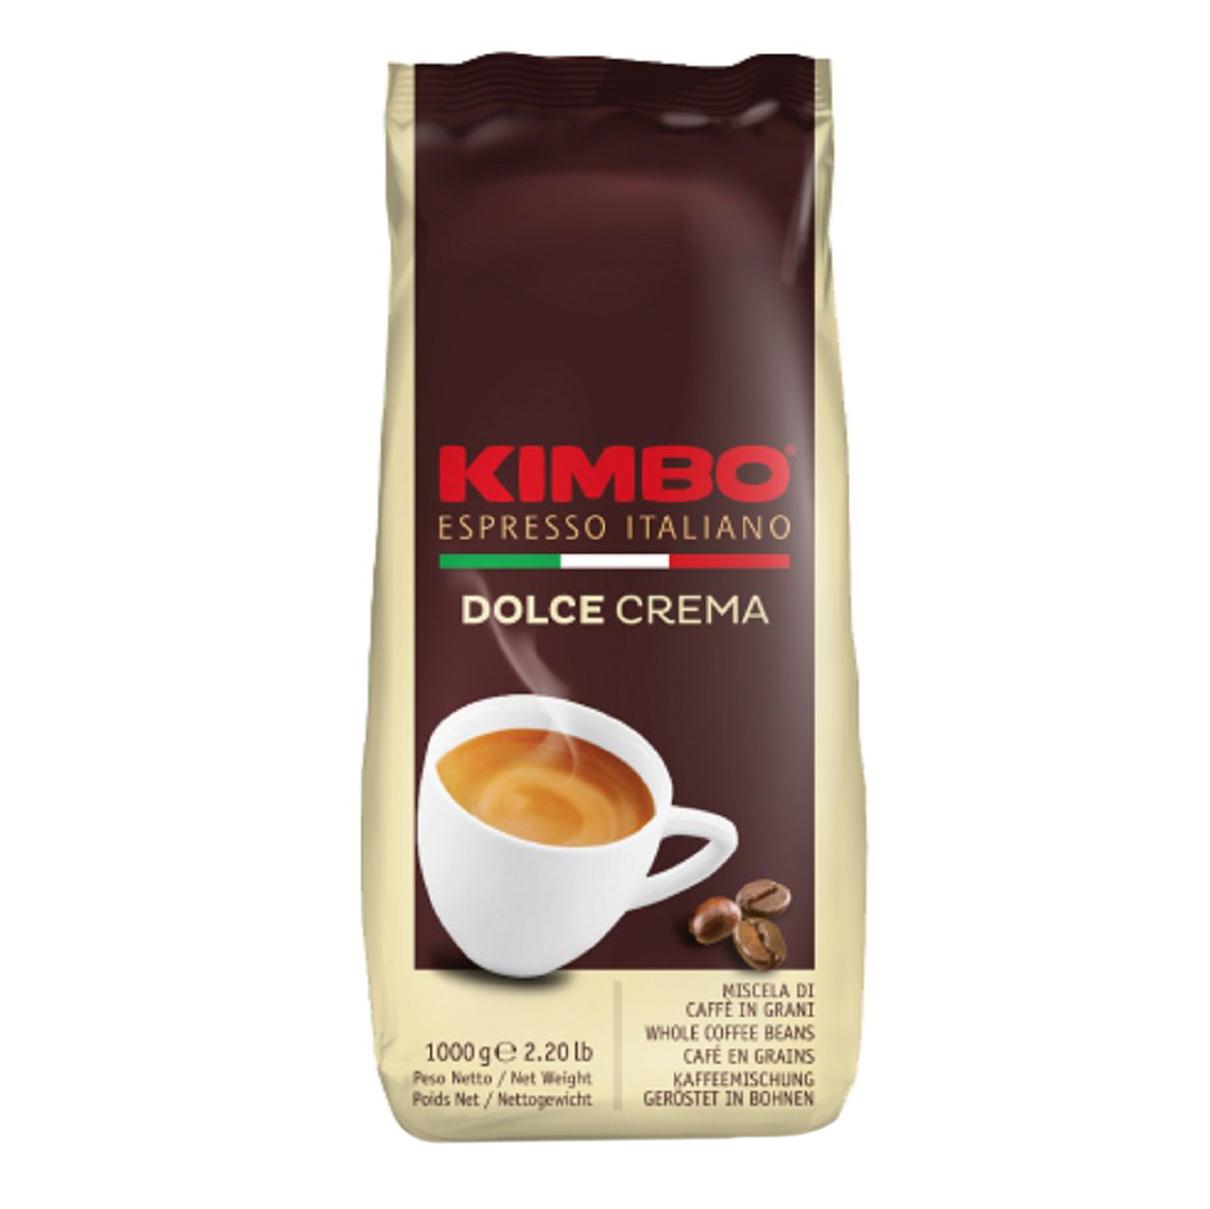 Кофе в зернах Kimbo Dolce Crema 1кг